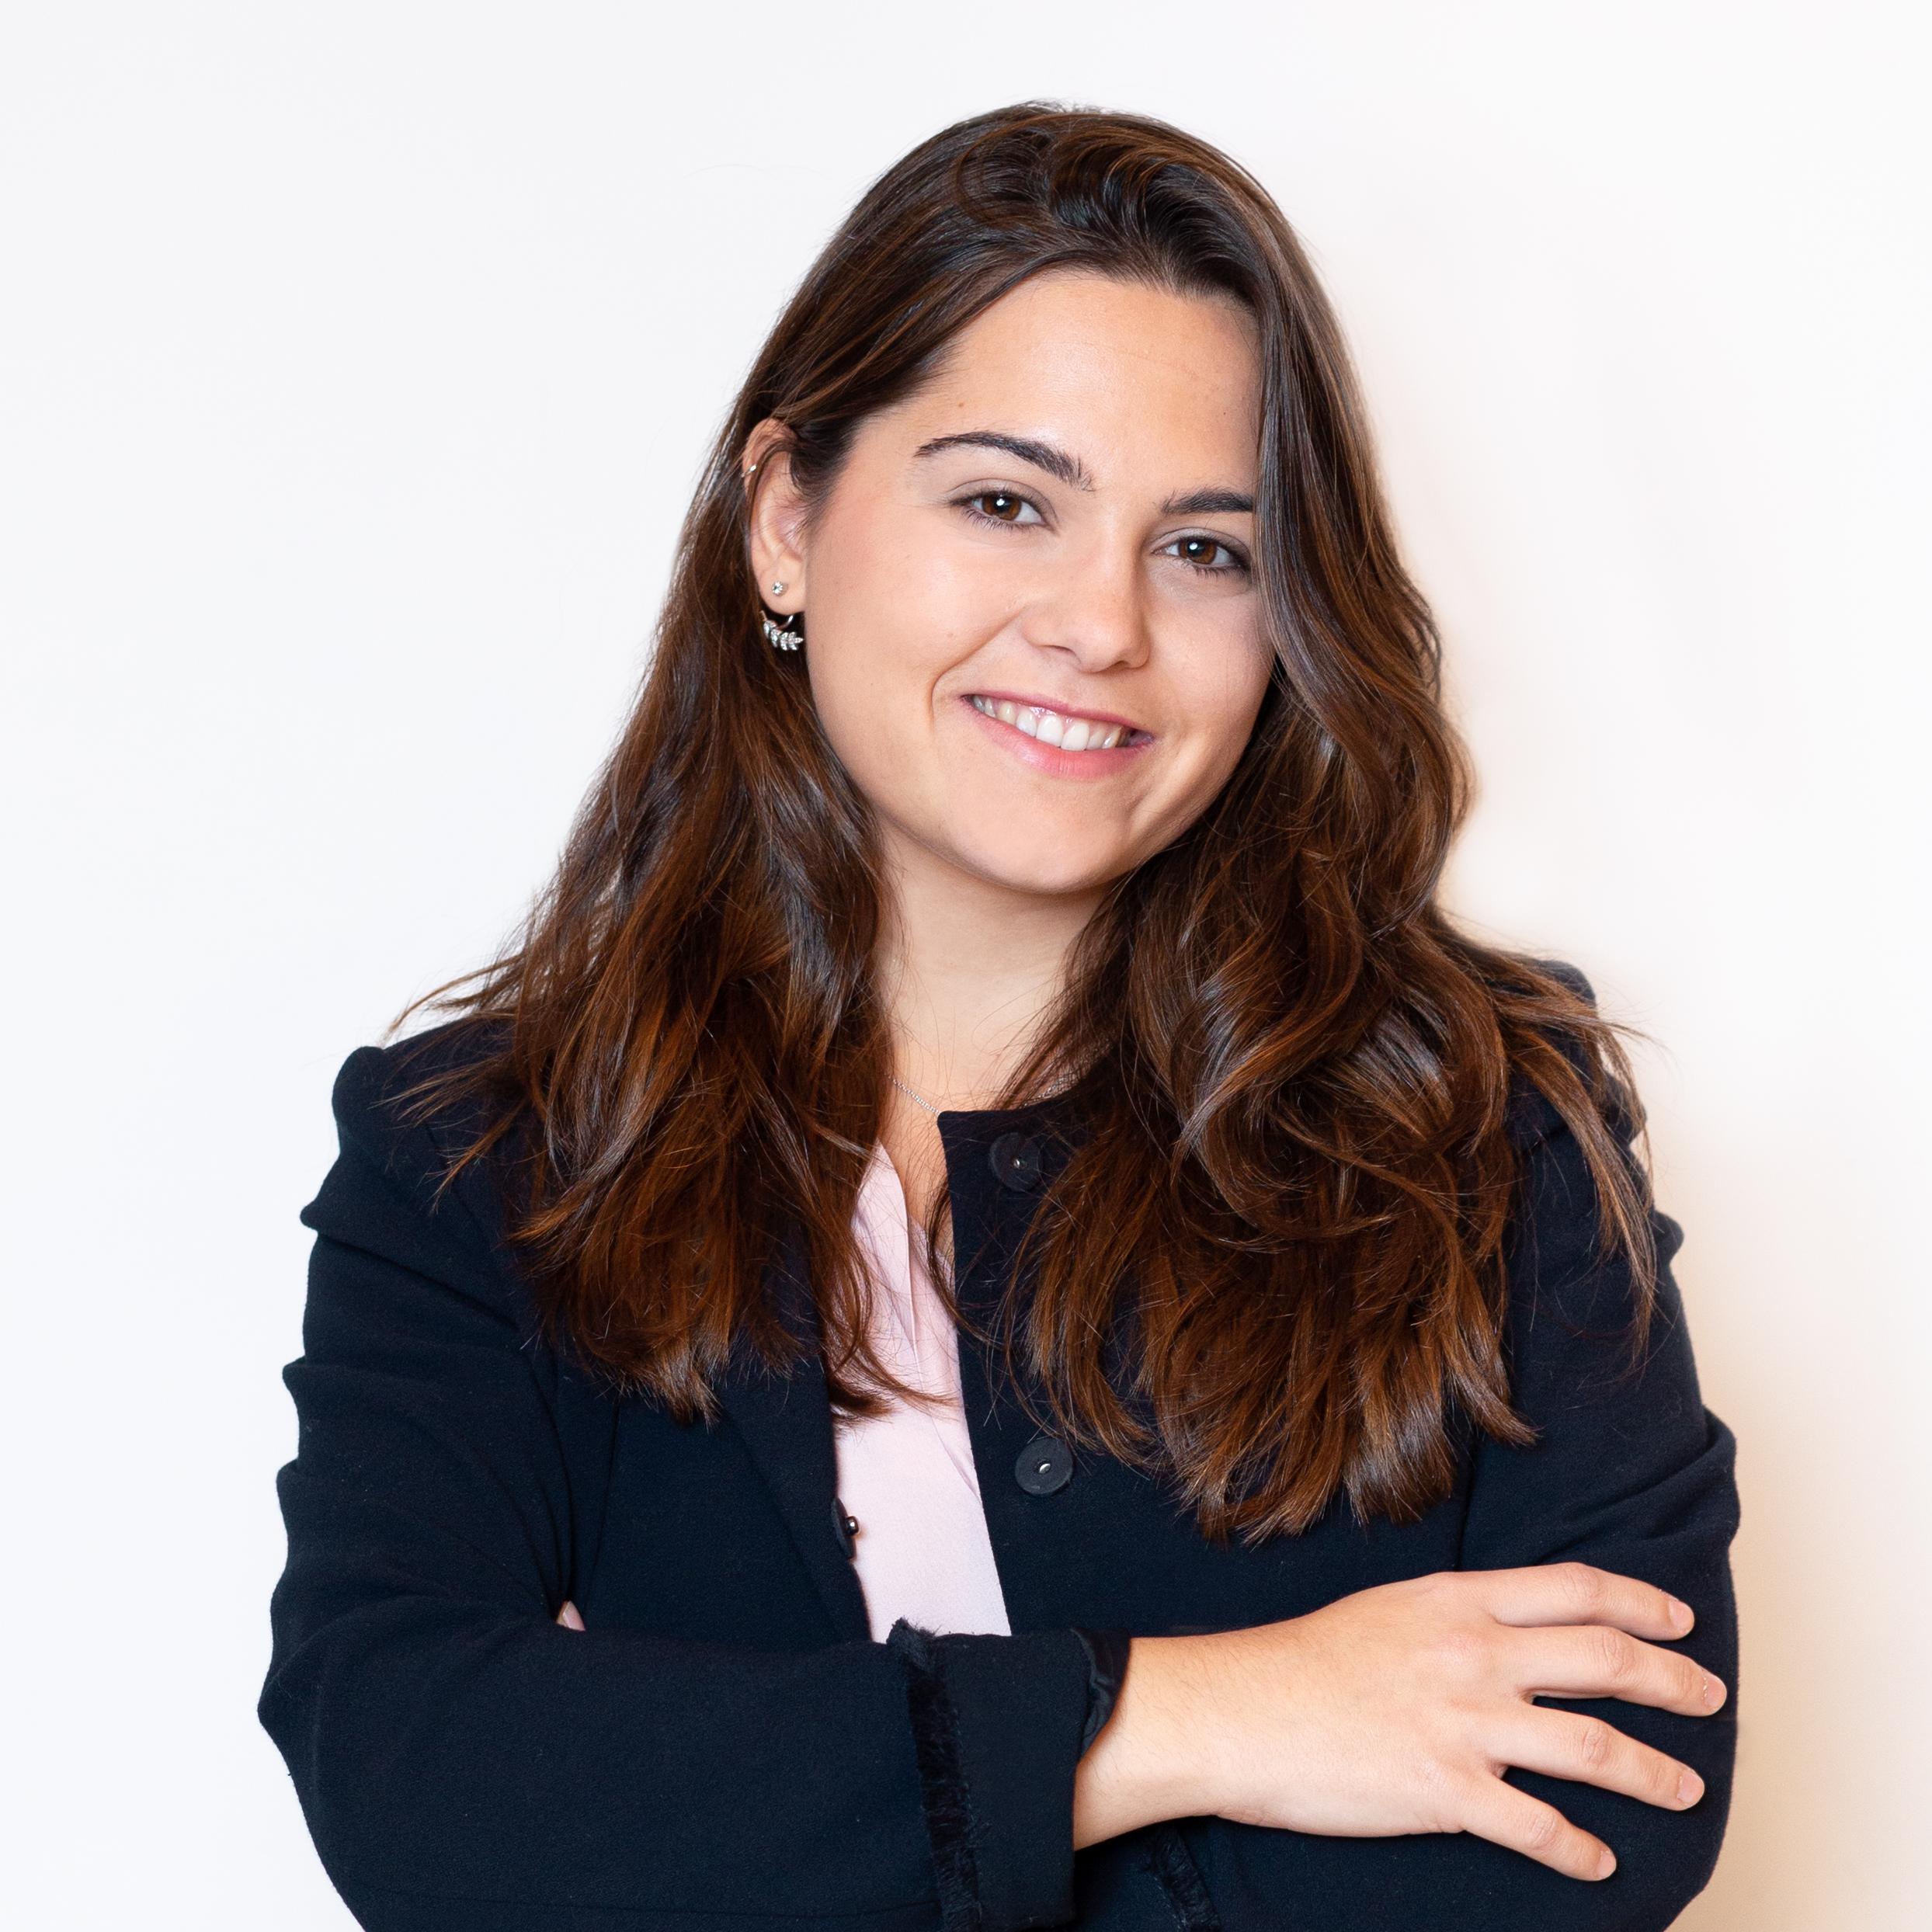 Irene García-Barroso Mela